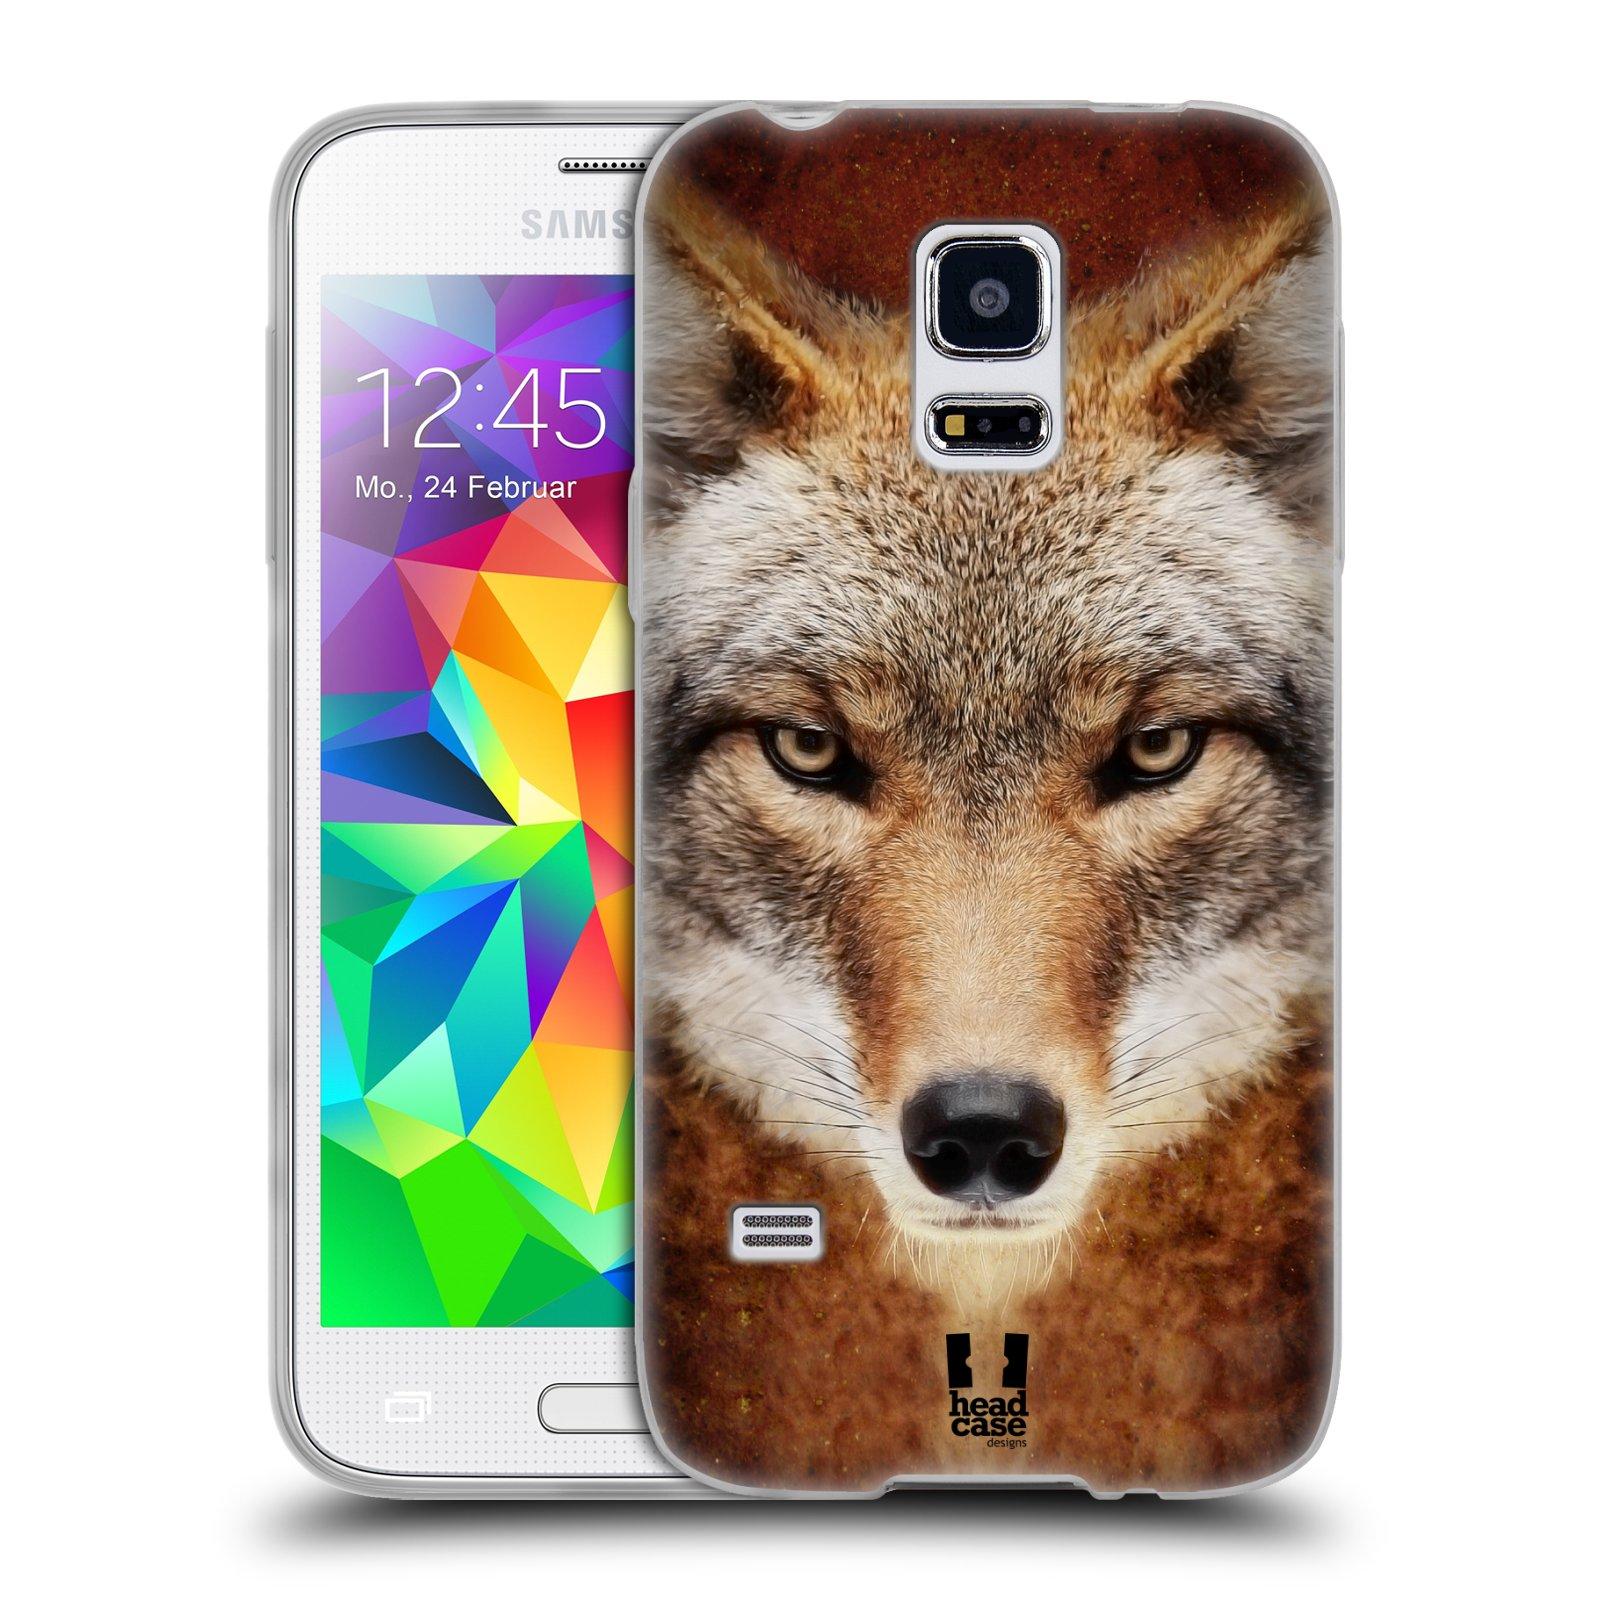 HEAD CASE silikonový obal na mobil Samsung Galaxy S5 MINI vzor Zvířecí tváře kojot